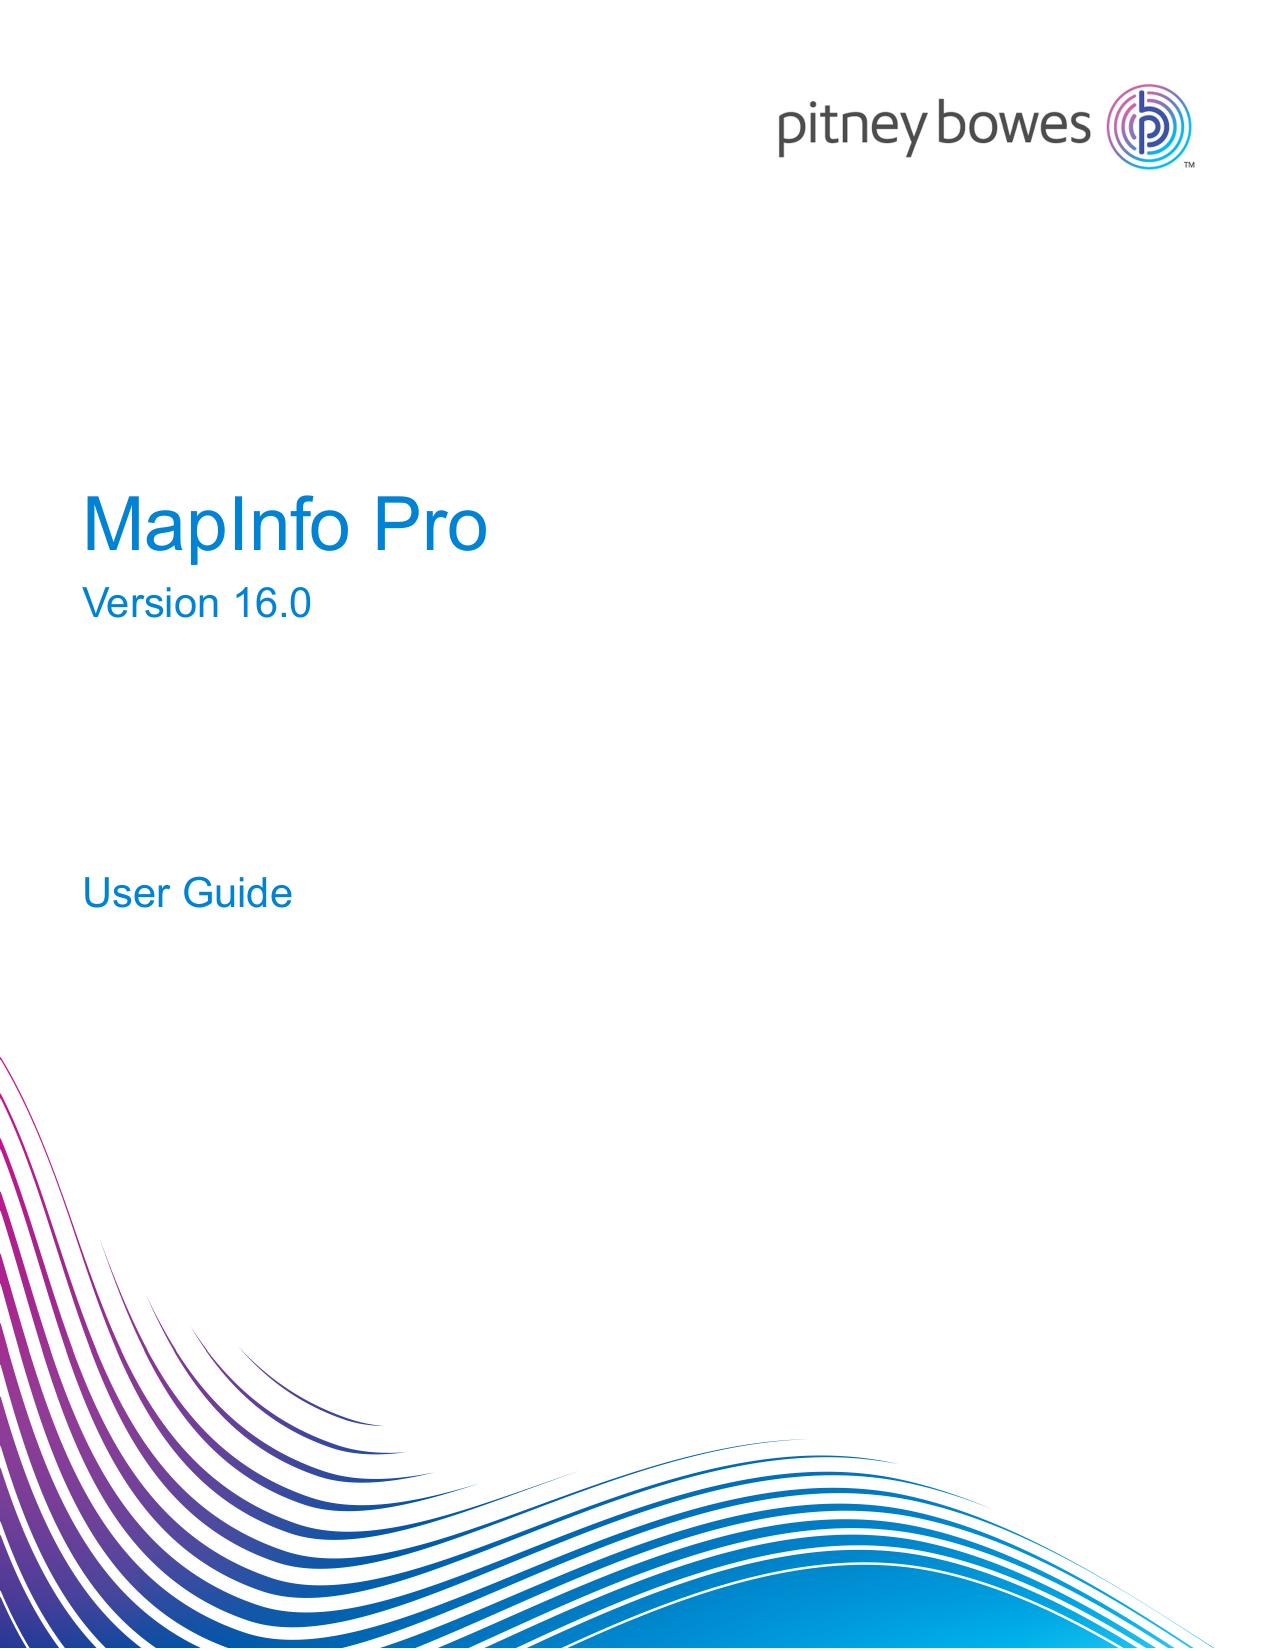 MapInfo Pro User Guide - Product Documentation   manualzz com